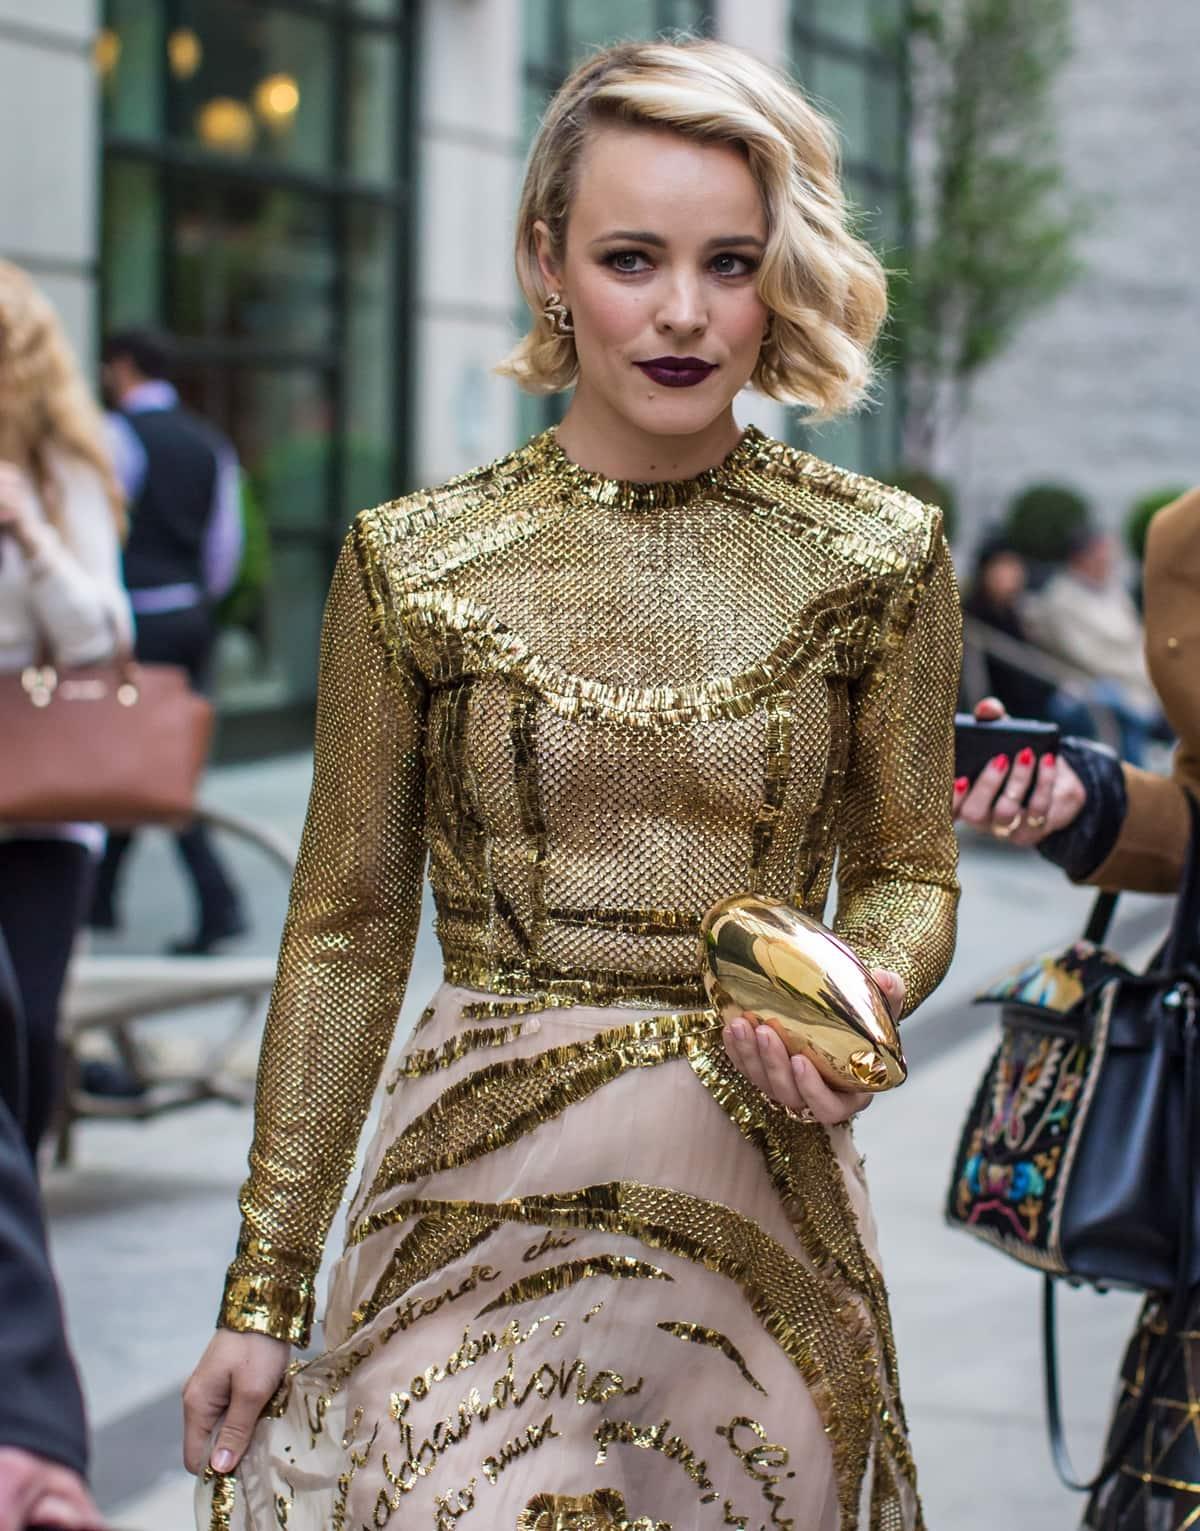 Rachel McAdams wears a gold mesh Valentino dress and dark purple lip as she makes her way to the Met Gala